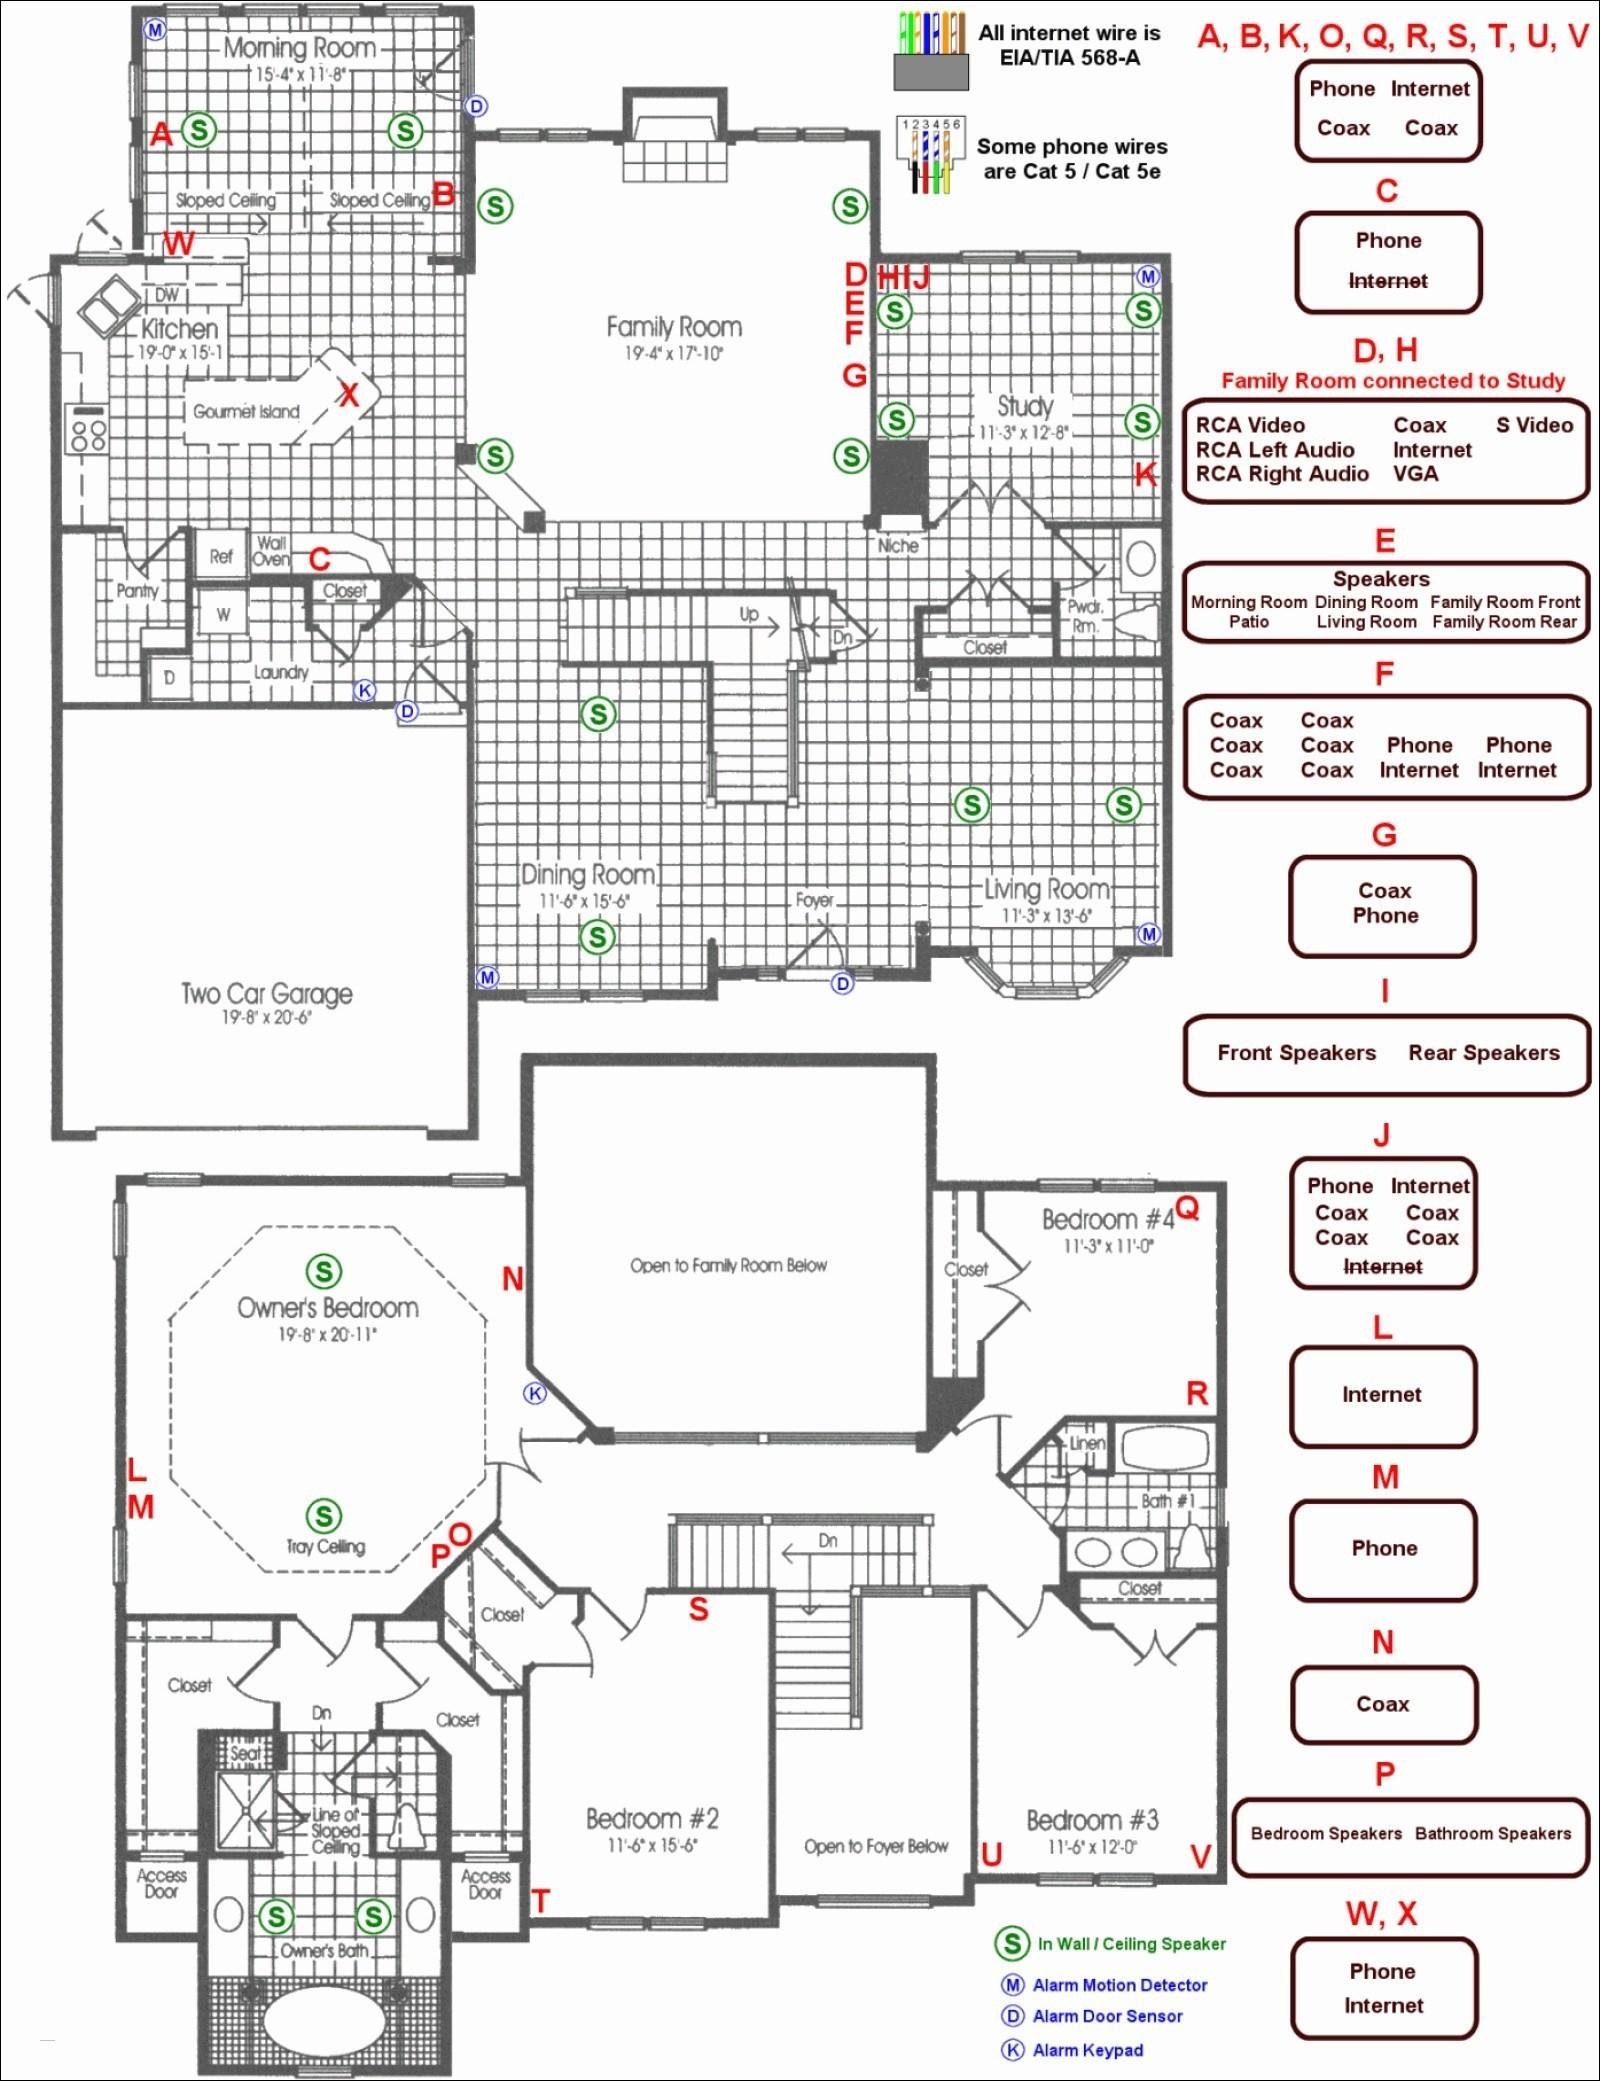 Residential Wiring Diagrams Residential Wiring Diagrams Wiring Diagram Article